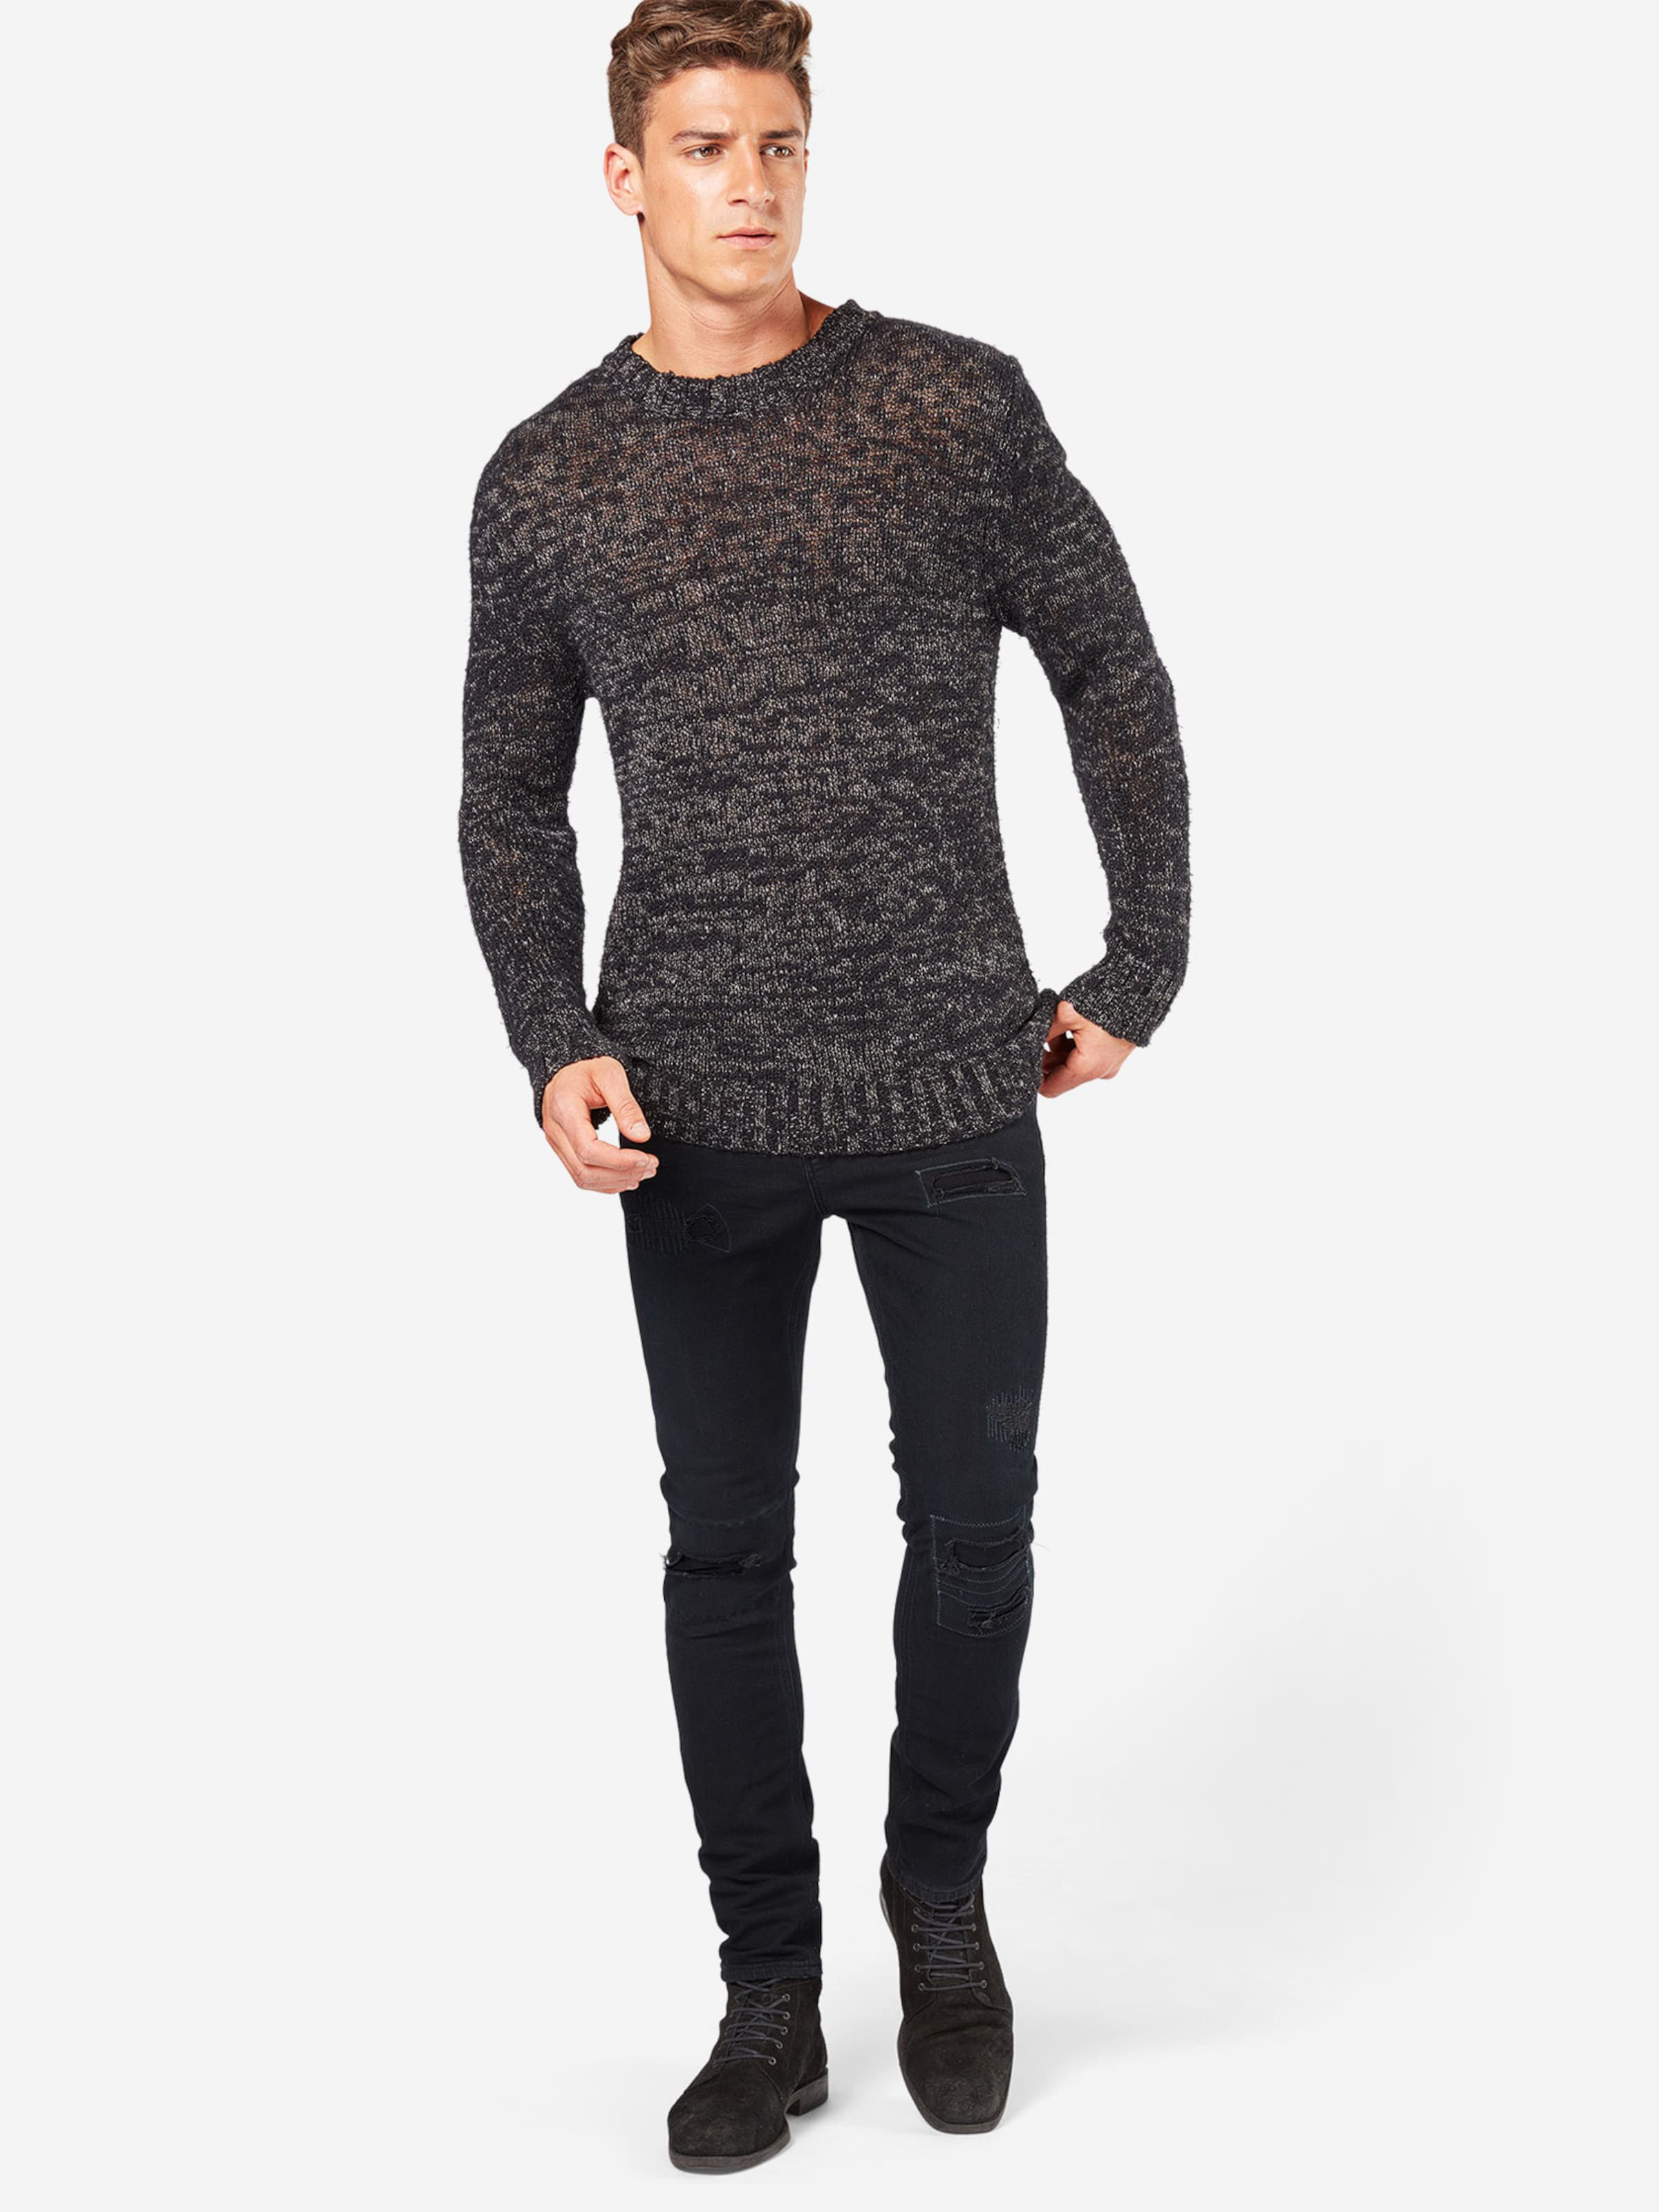 SCOTCH & SODA Jeans 'Lot 22 Skim - Lap Of Honour' Große Diskont Verkauf Online t6lf61ug